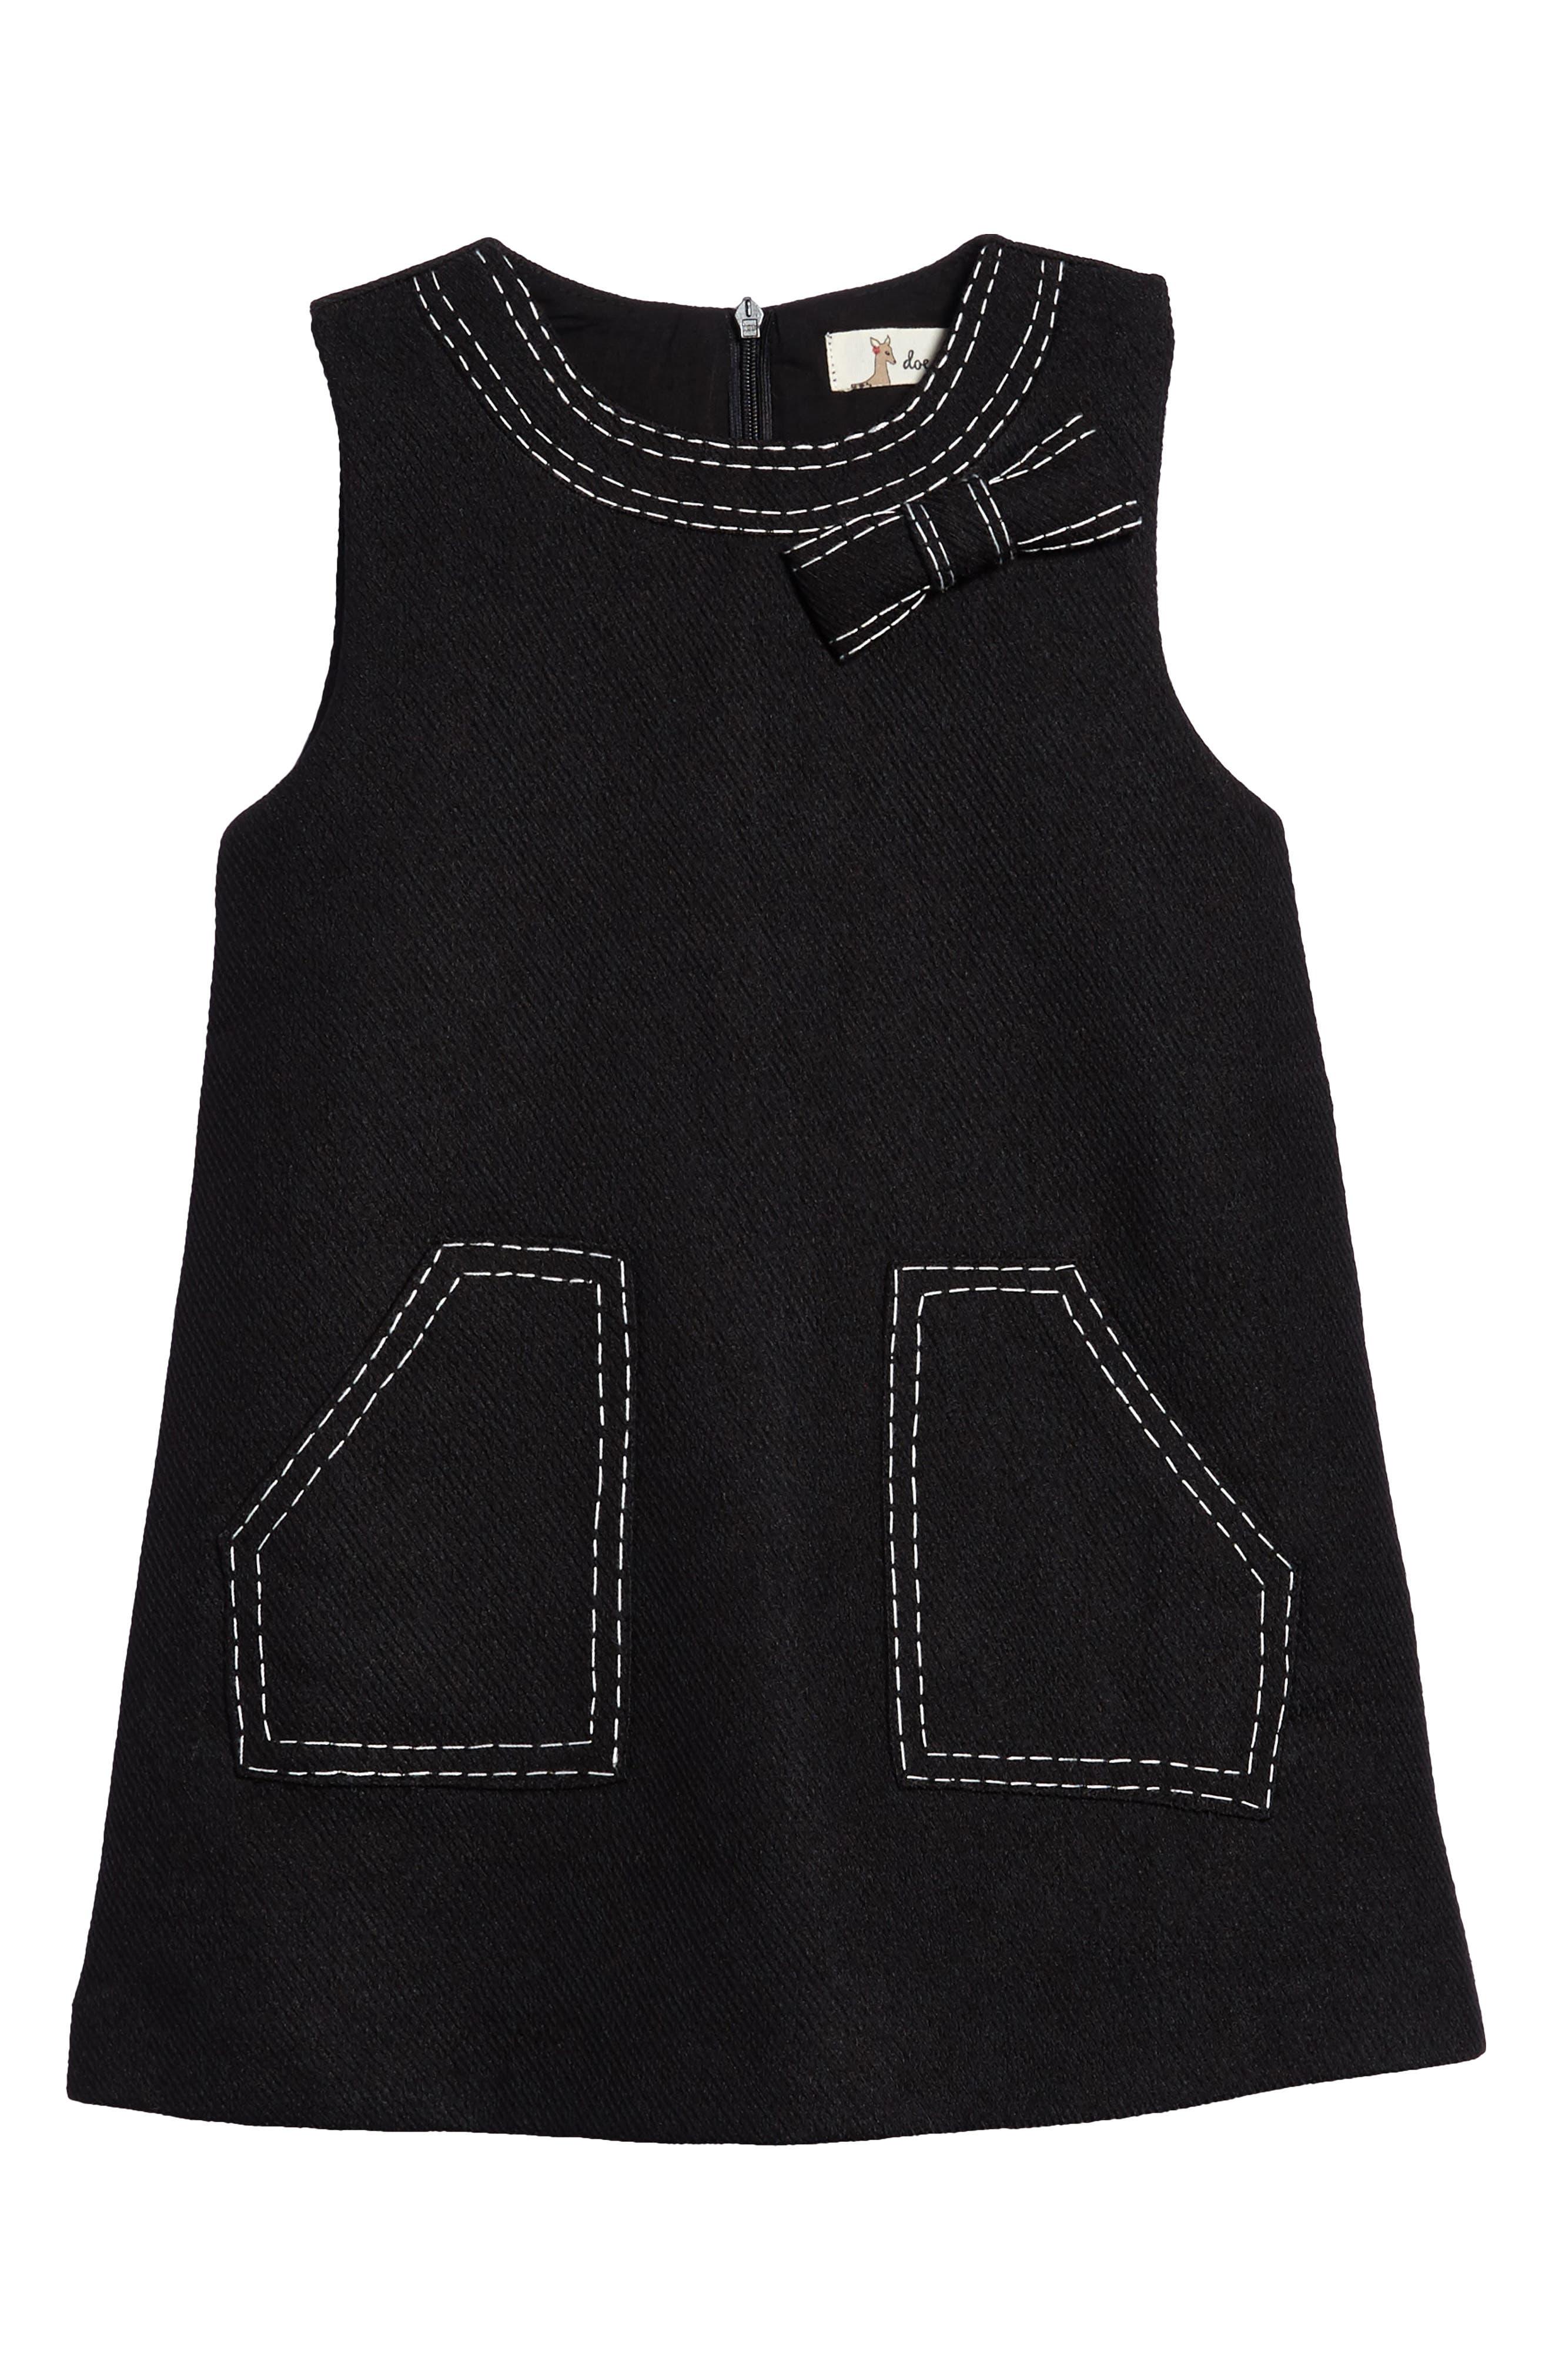 Mod Sleeveless Shift Dress,                         Main,                         color, 001